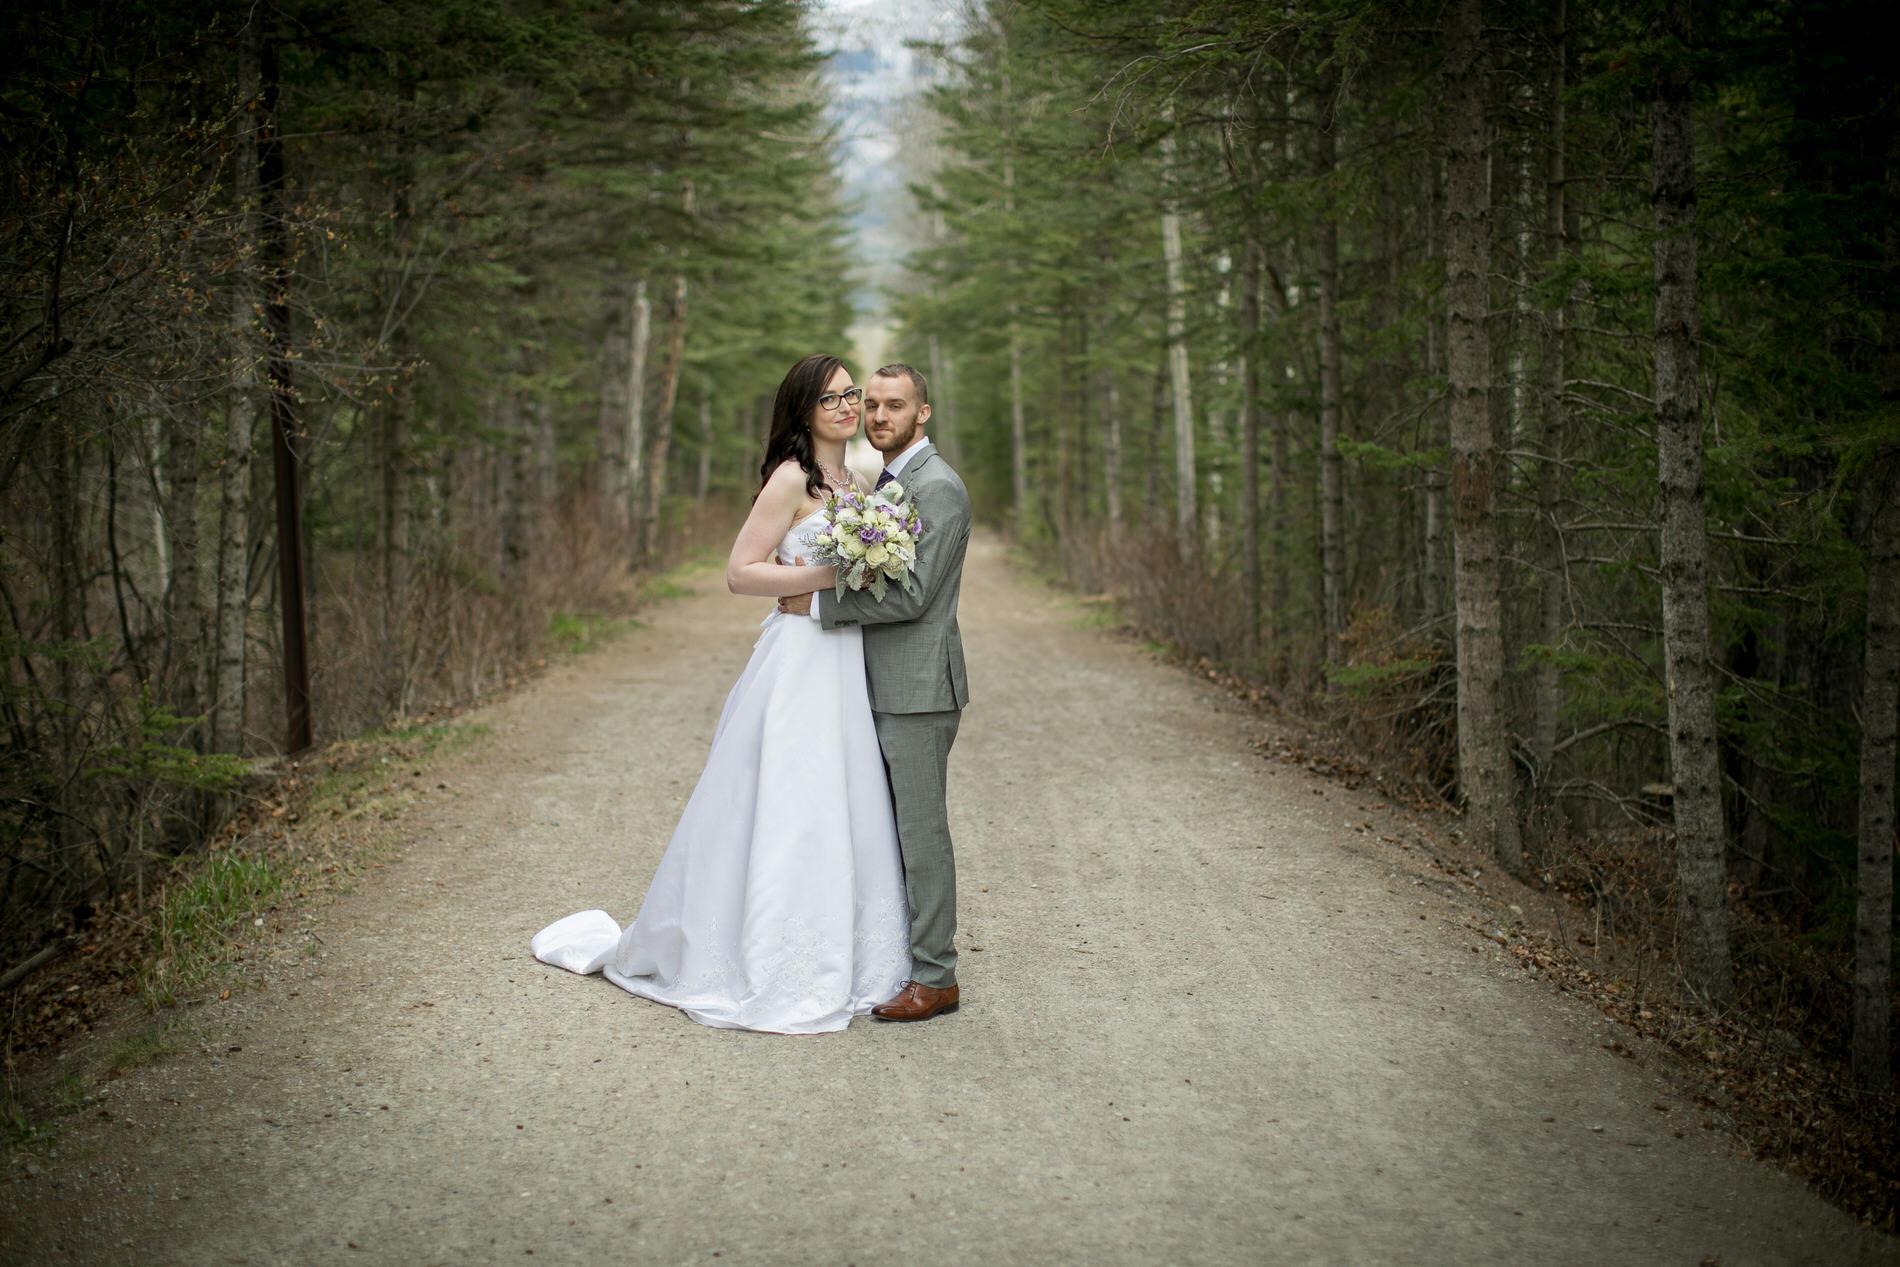 Chelsea and Jordan Wedding Blog026.jpg